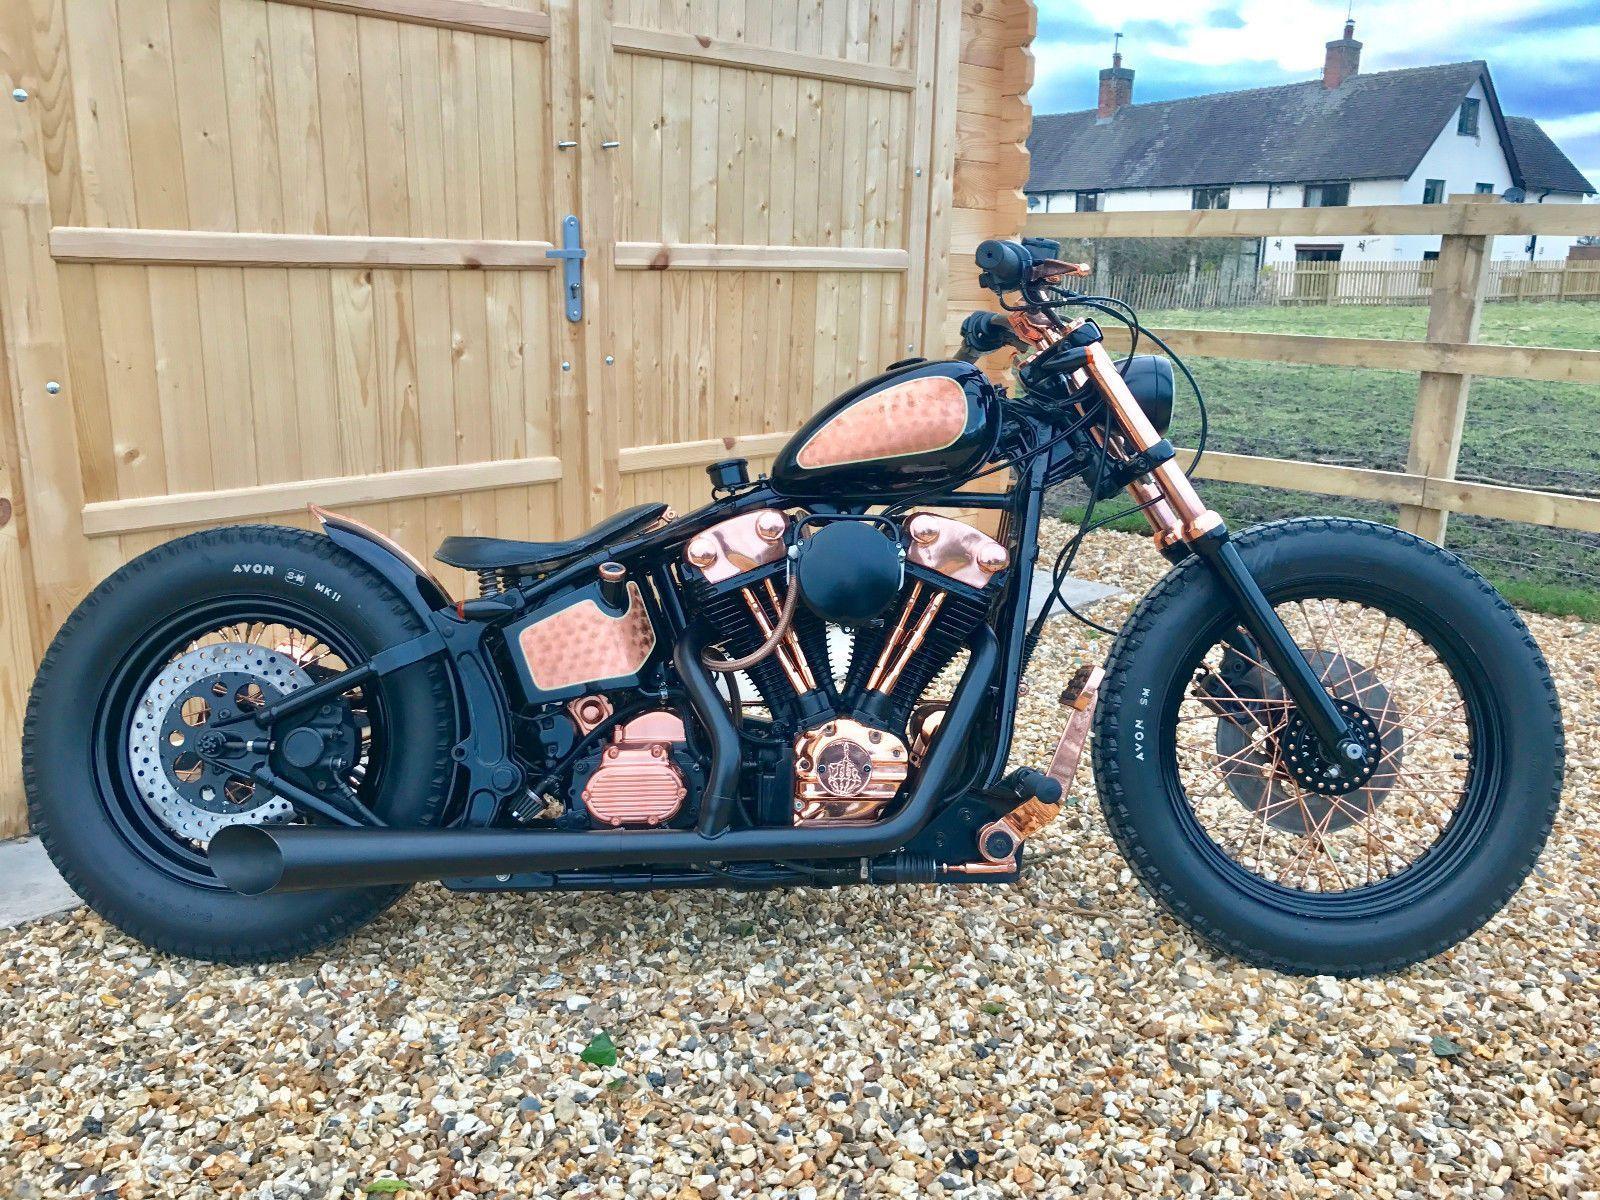 SOLD - Harley Davidson Softail Custom Bobber Chopper | eBay ...